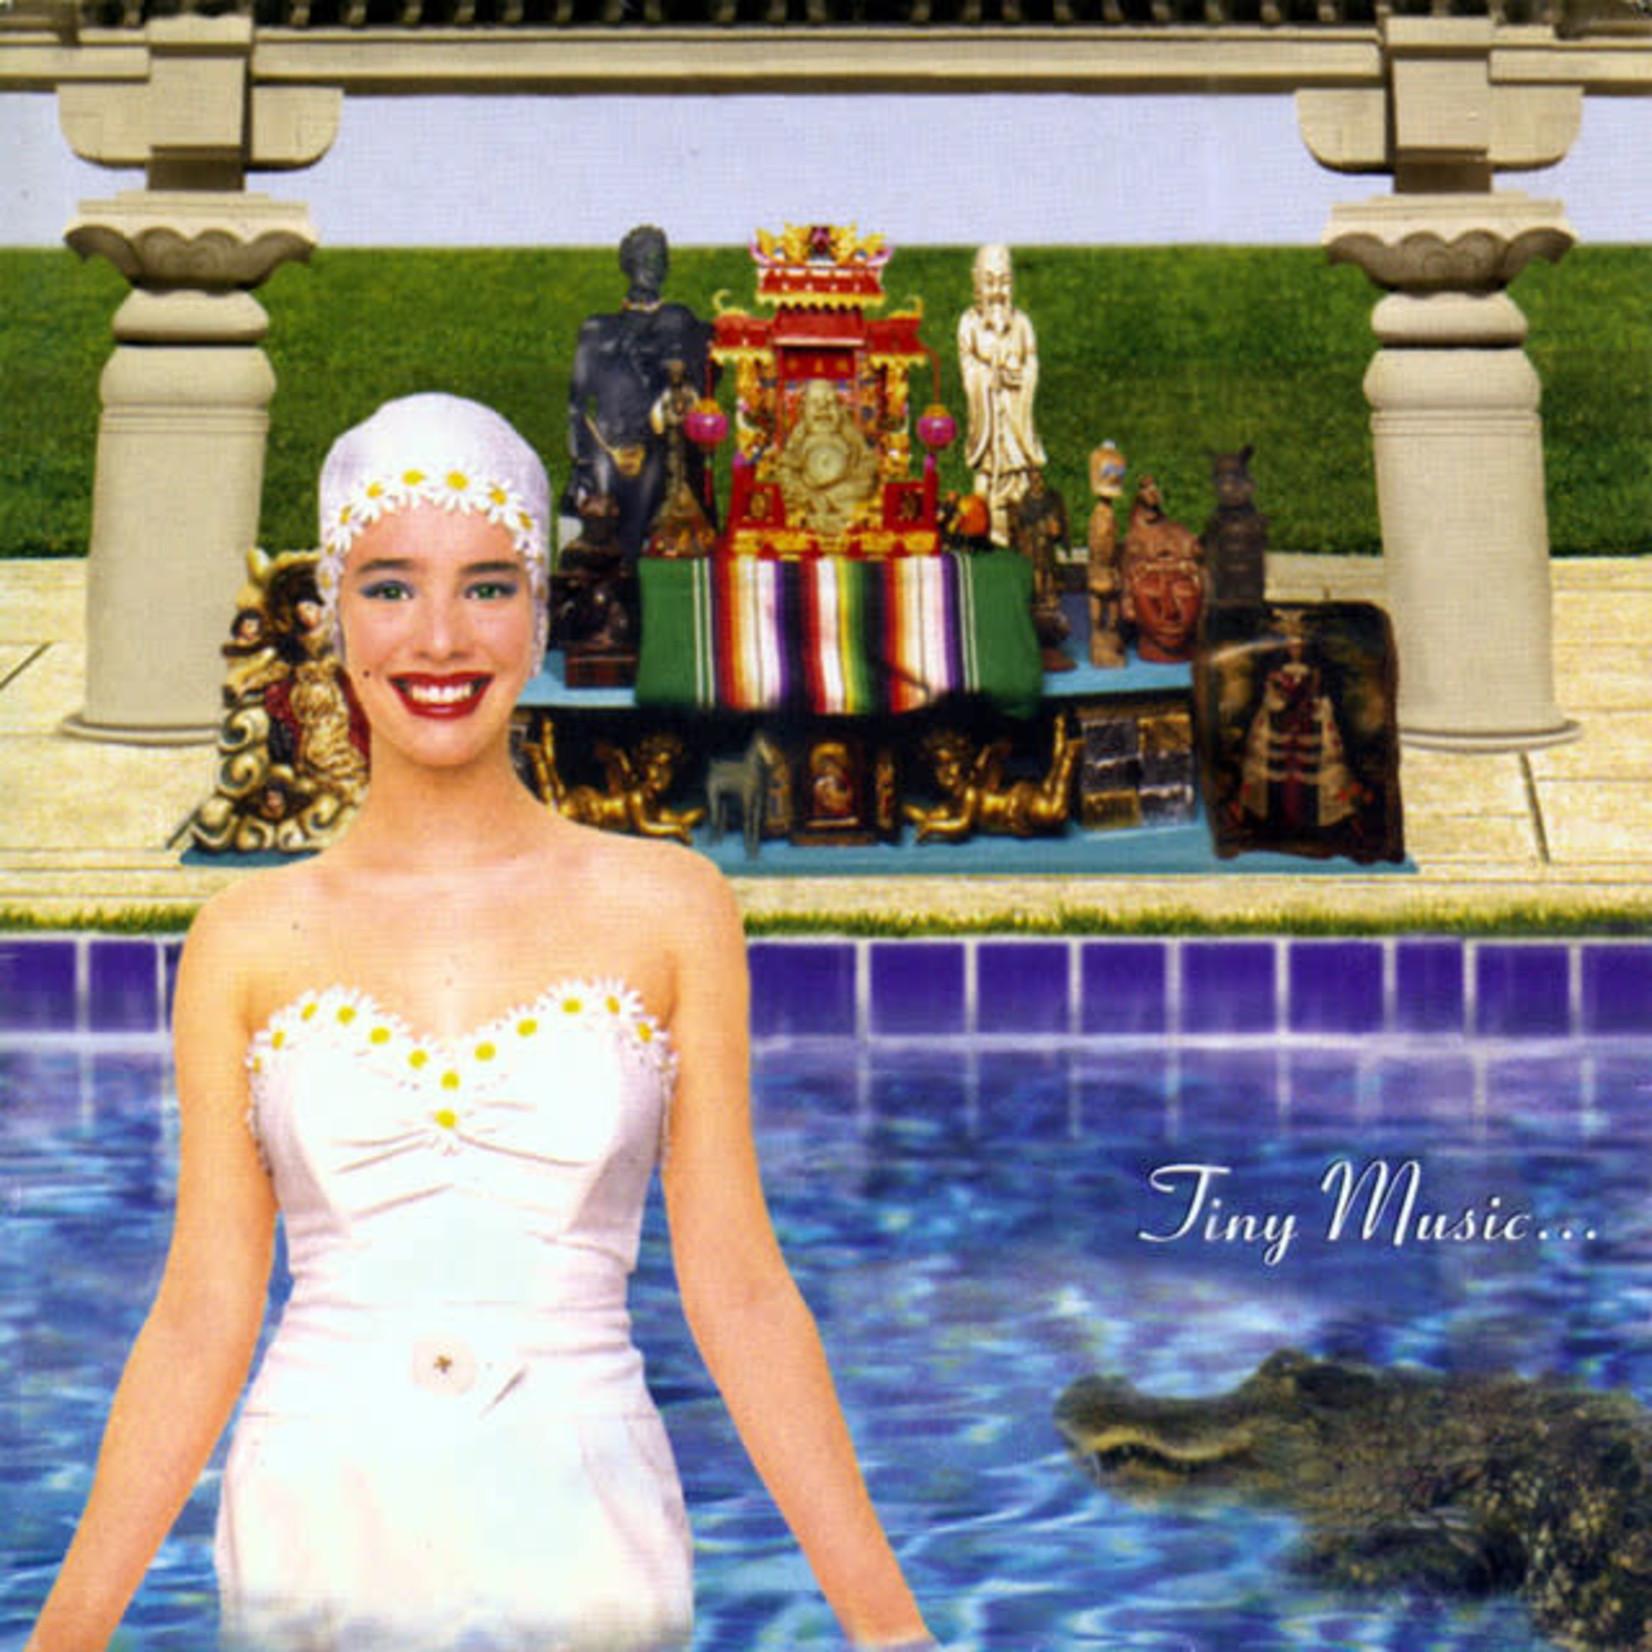 Vinyl Stone Temple Pilots - Tiny Music